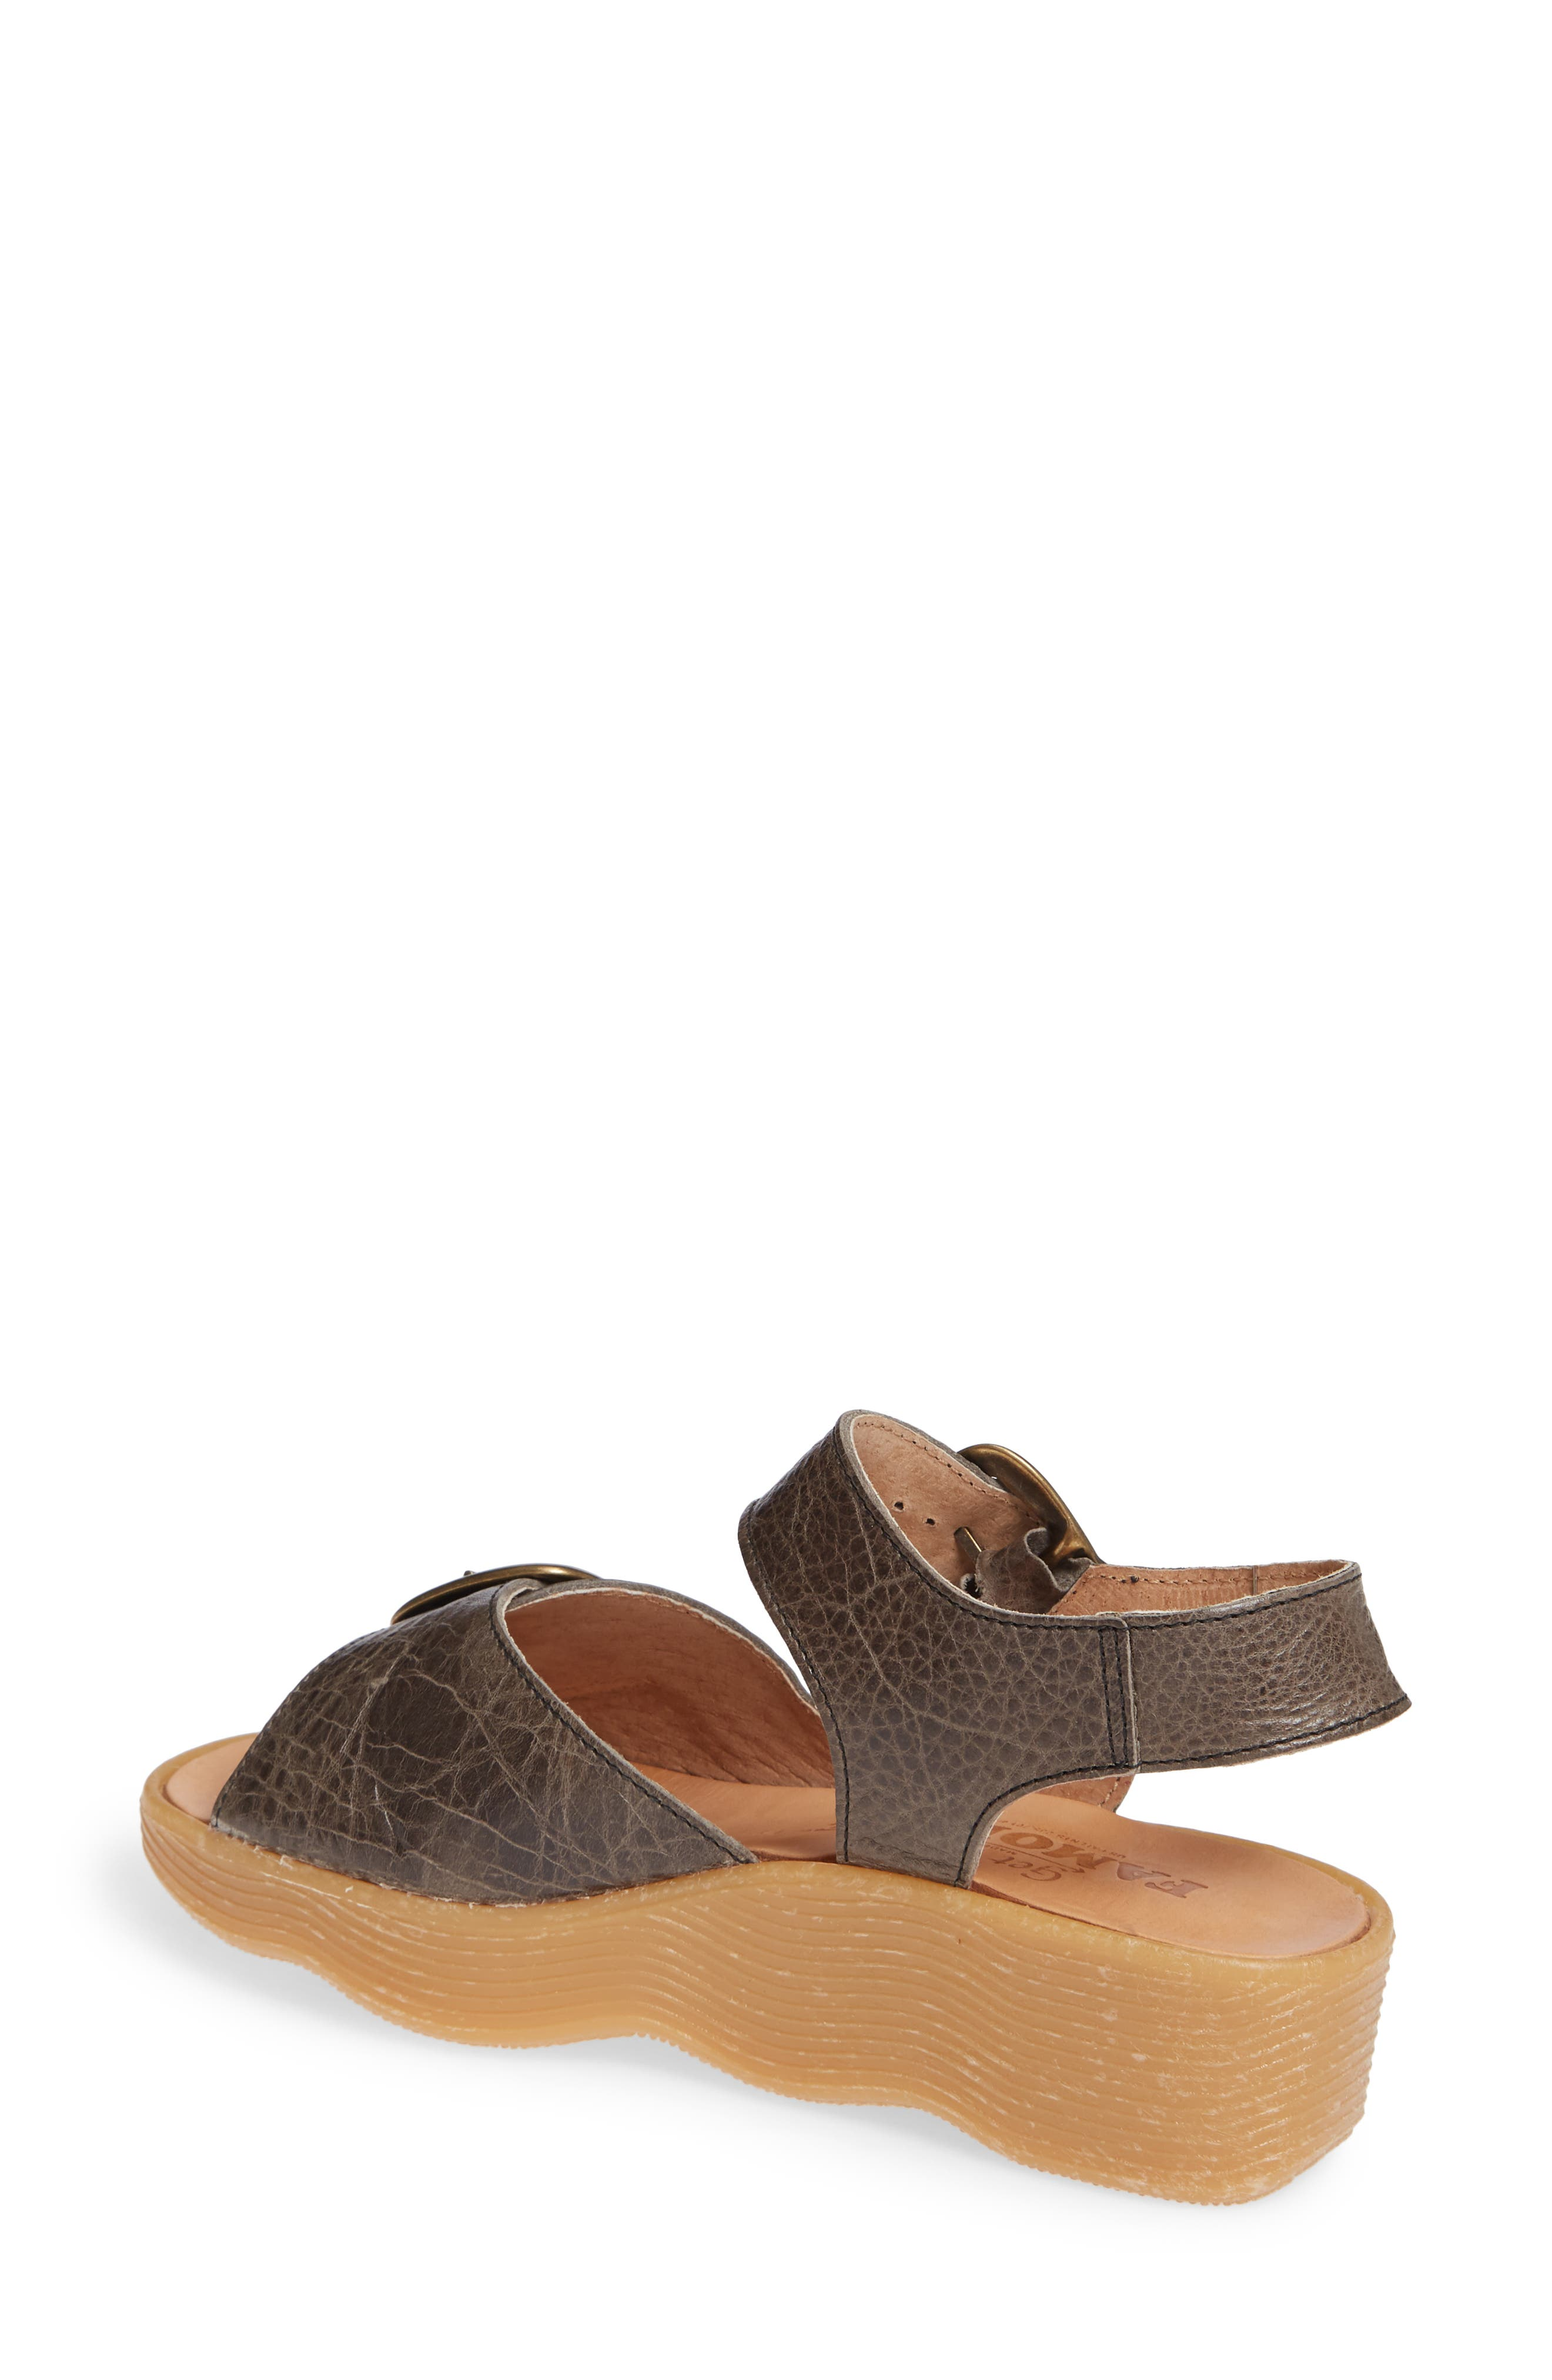 Double Play Platform Sandal,                             Alternate thumbnail 2, color,                             STEEL SUEDE